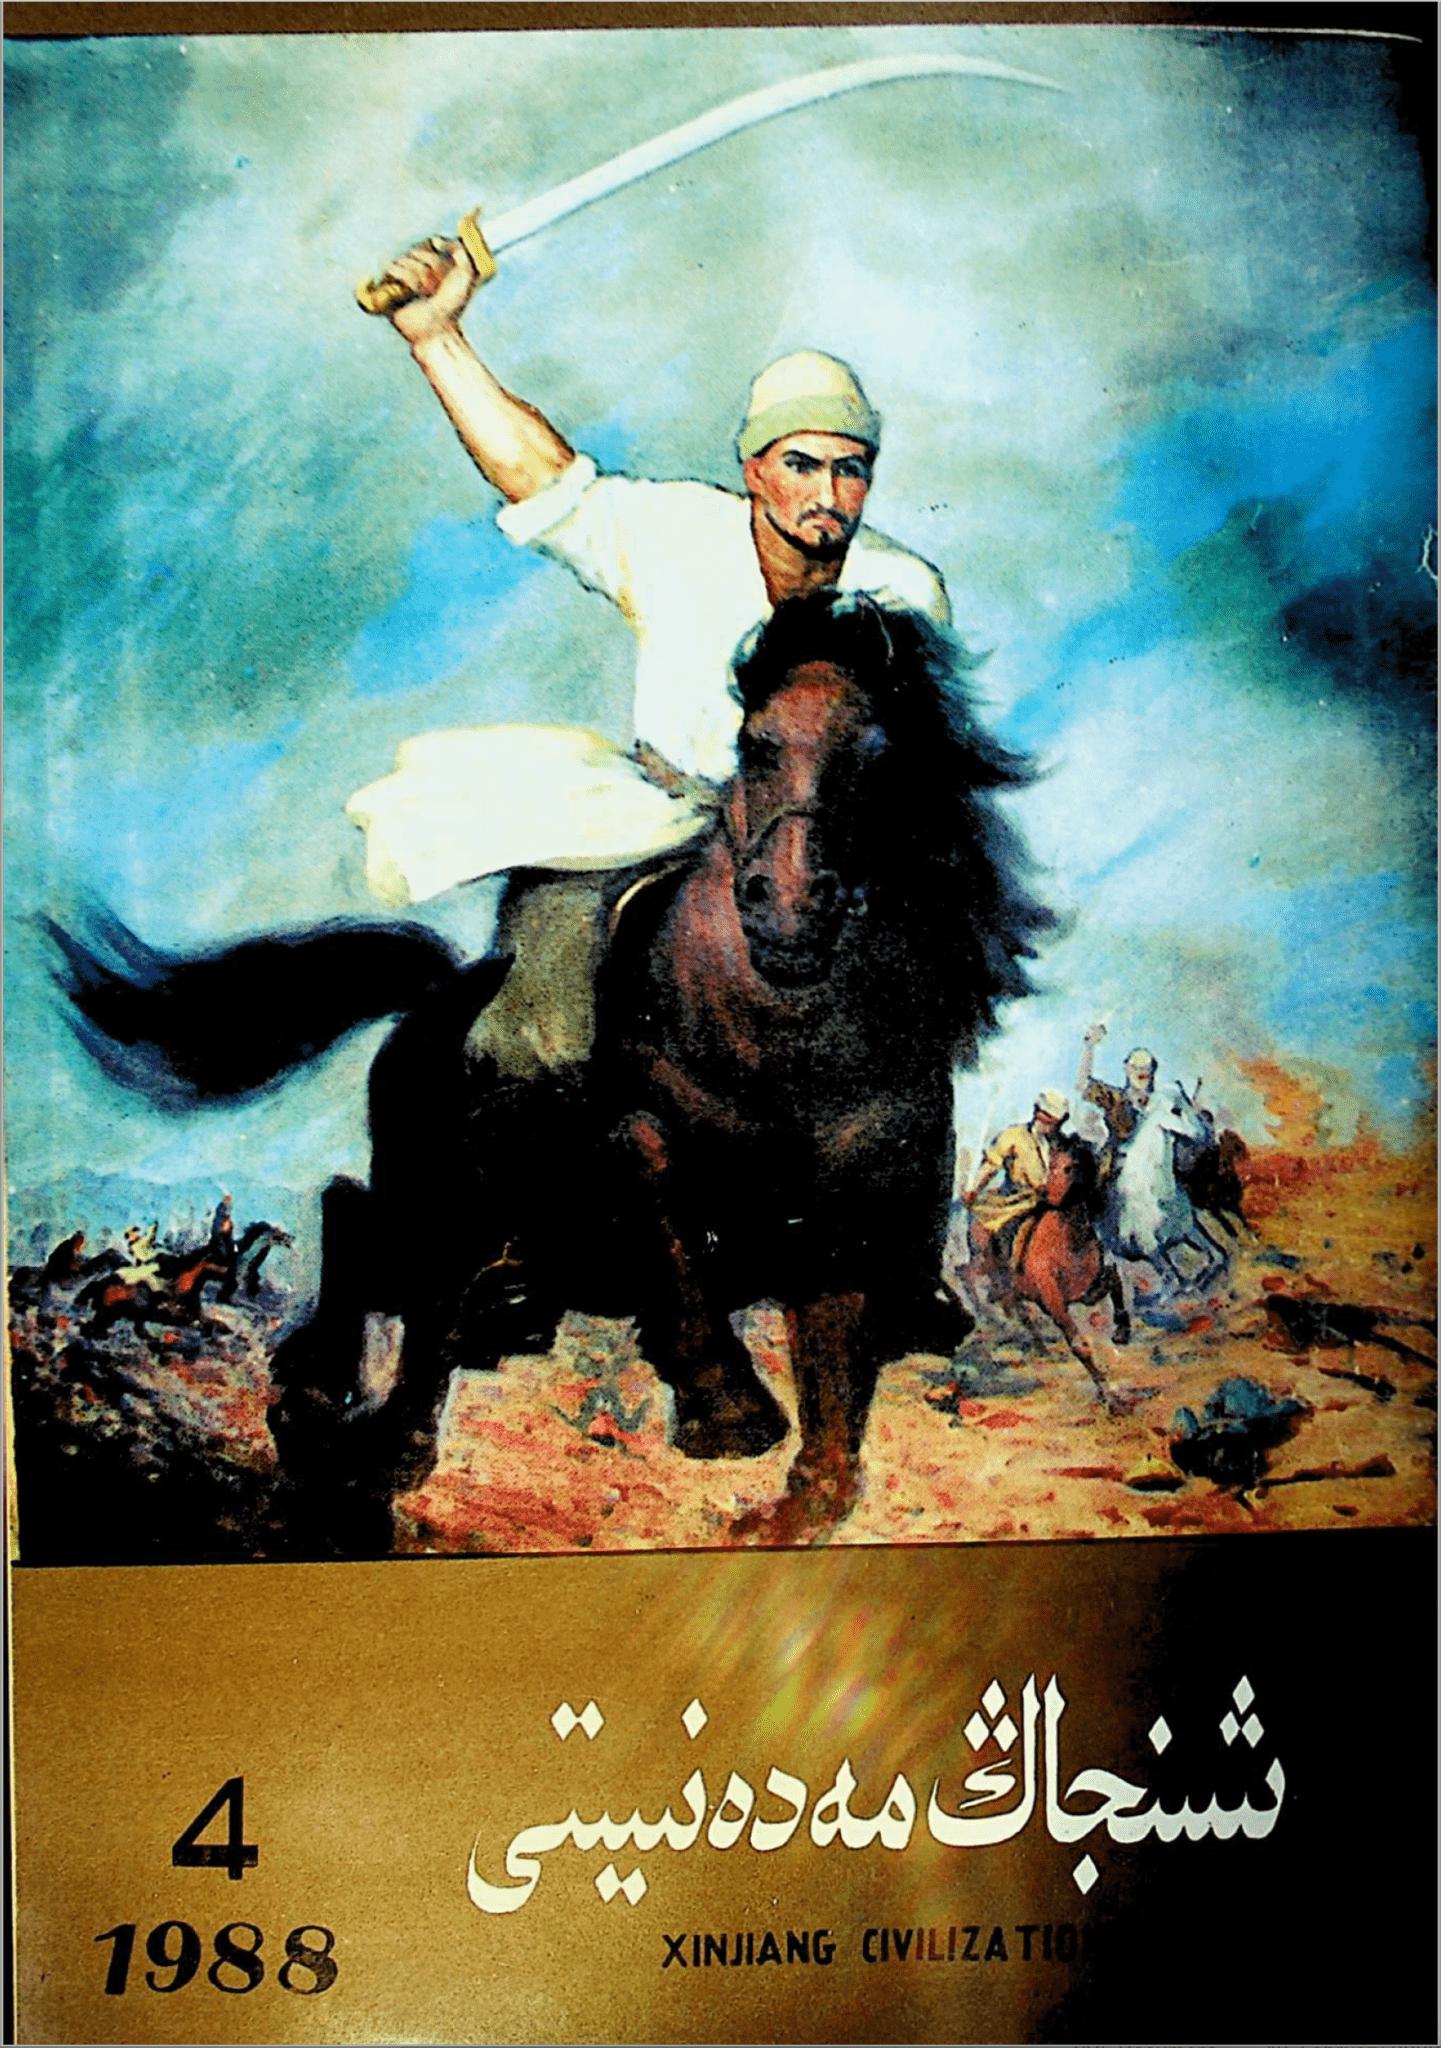 Screenshot 2020 03 08 at 15.34.02 - شىنجاڭ مەدەنىيىتى 1988-يىلى 4-سان